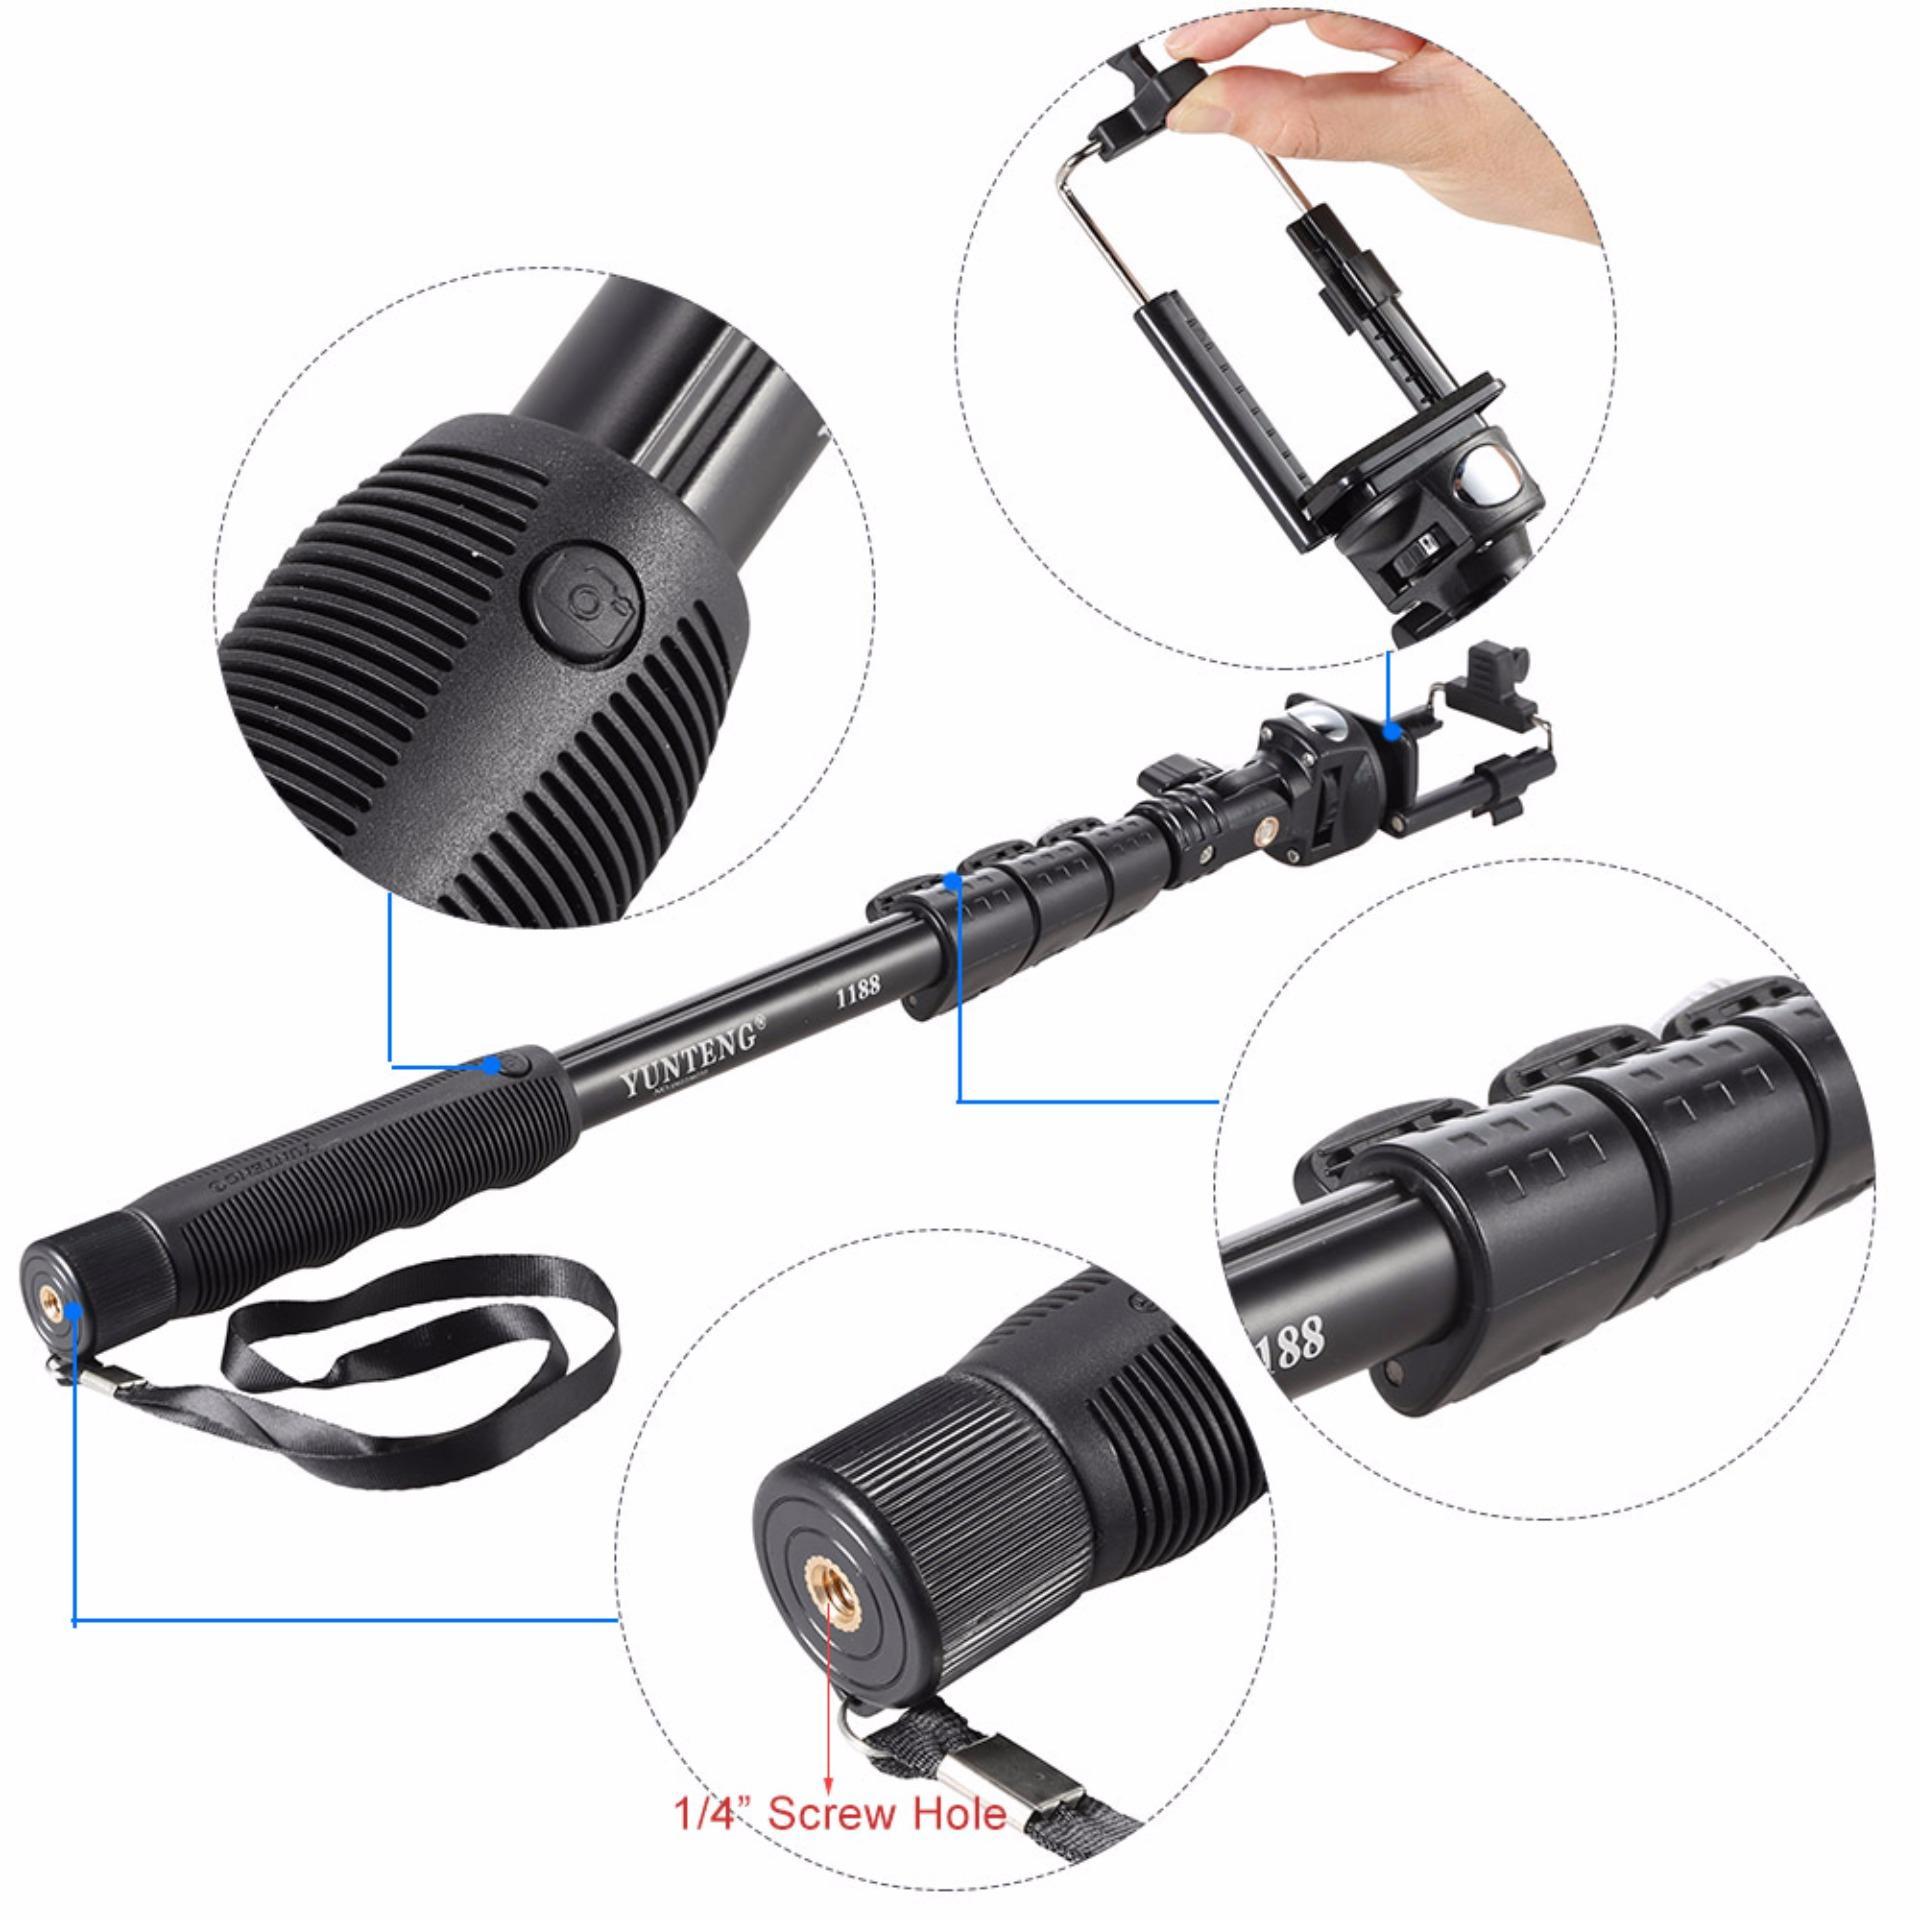 Yunteng Yt 1288 Tongsis Selfie Stick Monopod Uholder Lensasuperwide Source · Yunteng YT 1188 Tongsis Kabel Monopod Built in AUX Cable and KEYSHUTTER Hitam